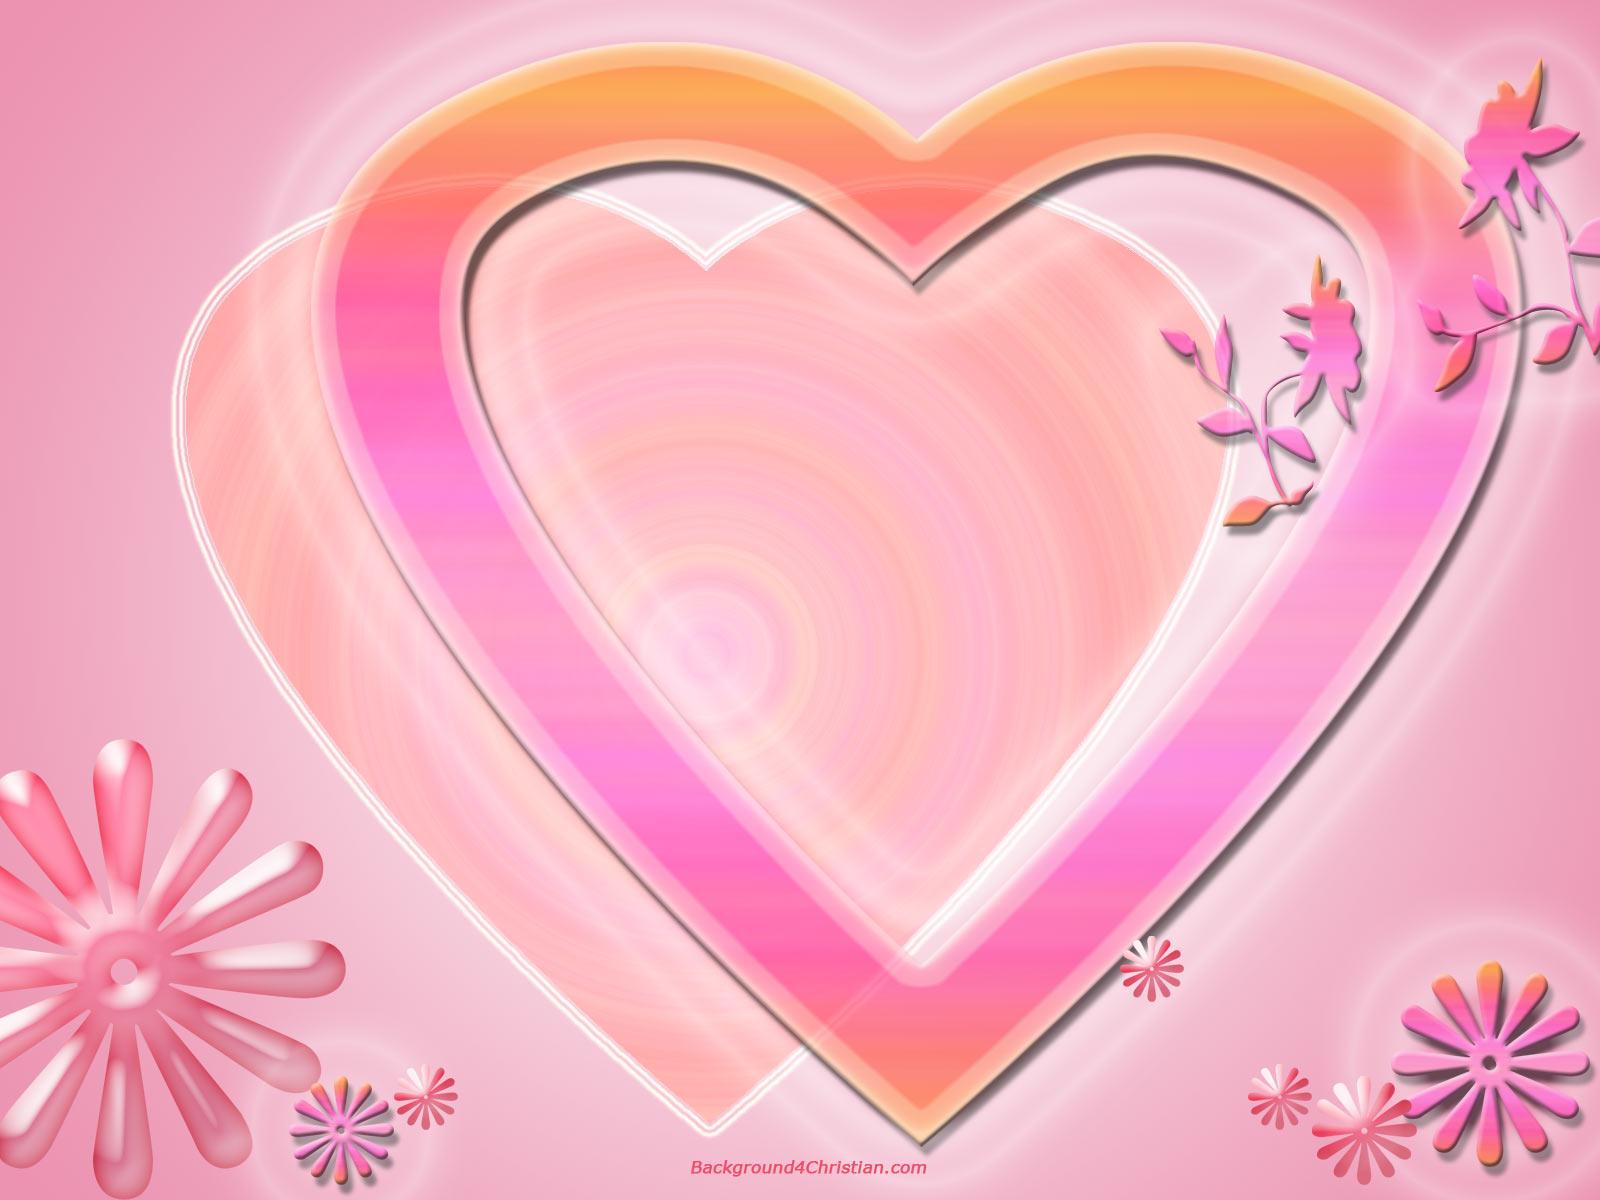 http://2.bp.blogspot.com/_HUYqVp13qlI/TPnVHO_ziYI/AAAAAAAAACo/Jn4Eeoq05AI/s1600/pink-valentine-heart1.jpg